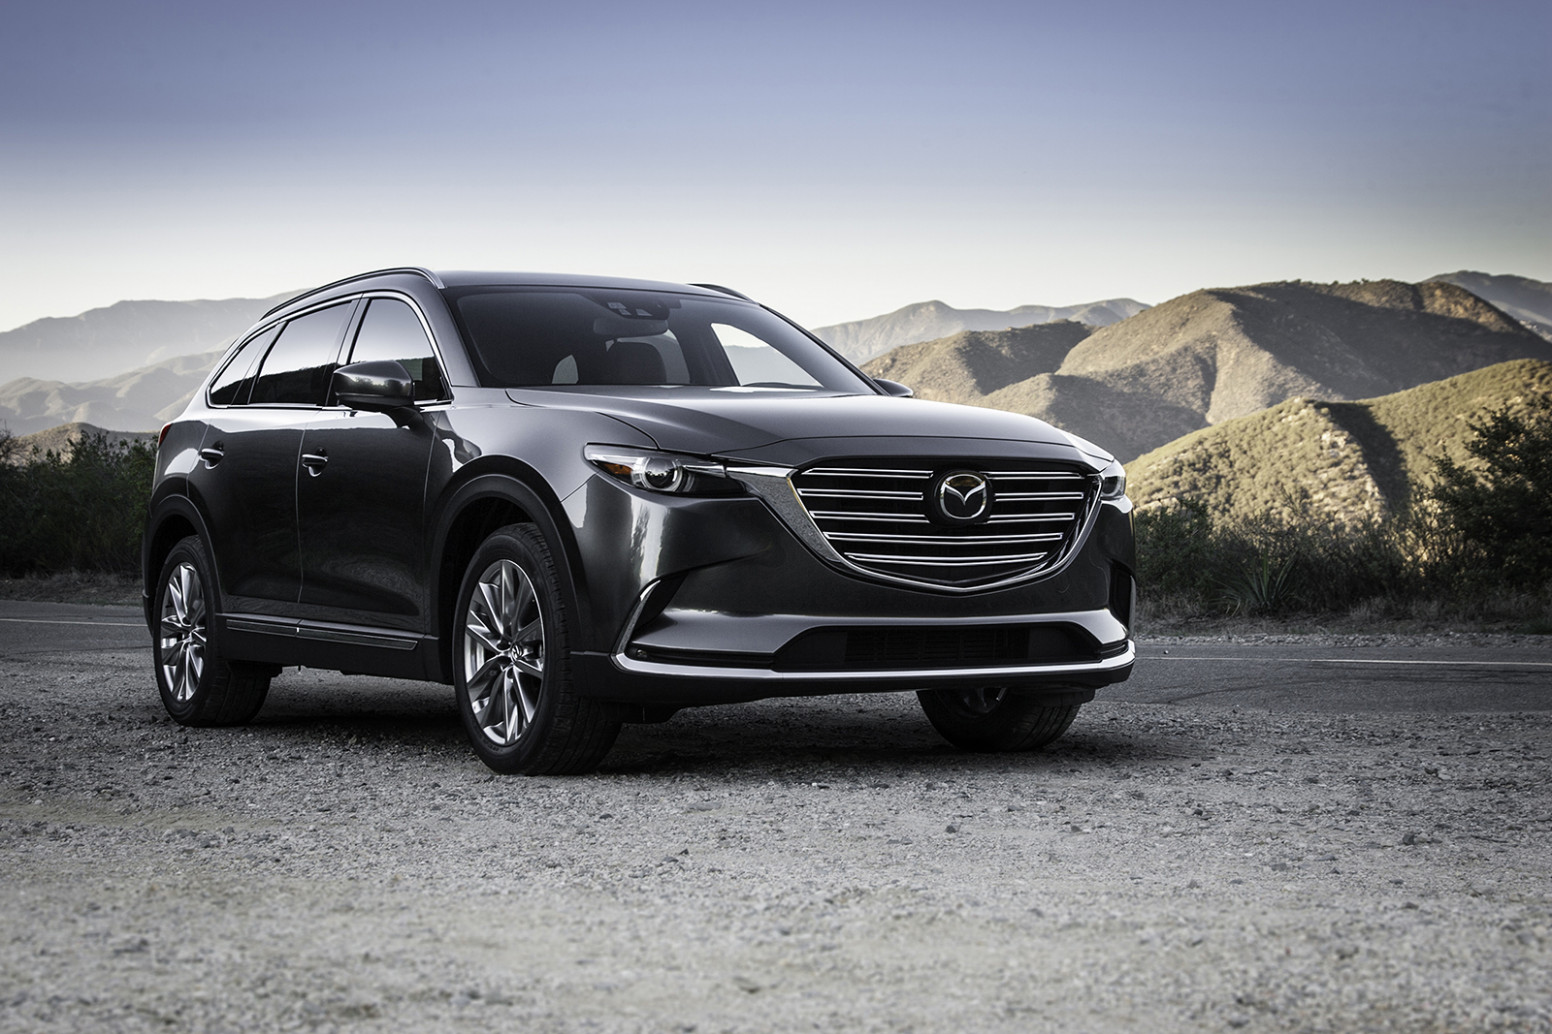 Pictures 2022 Mazda CX-9